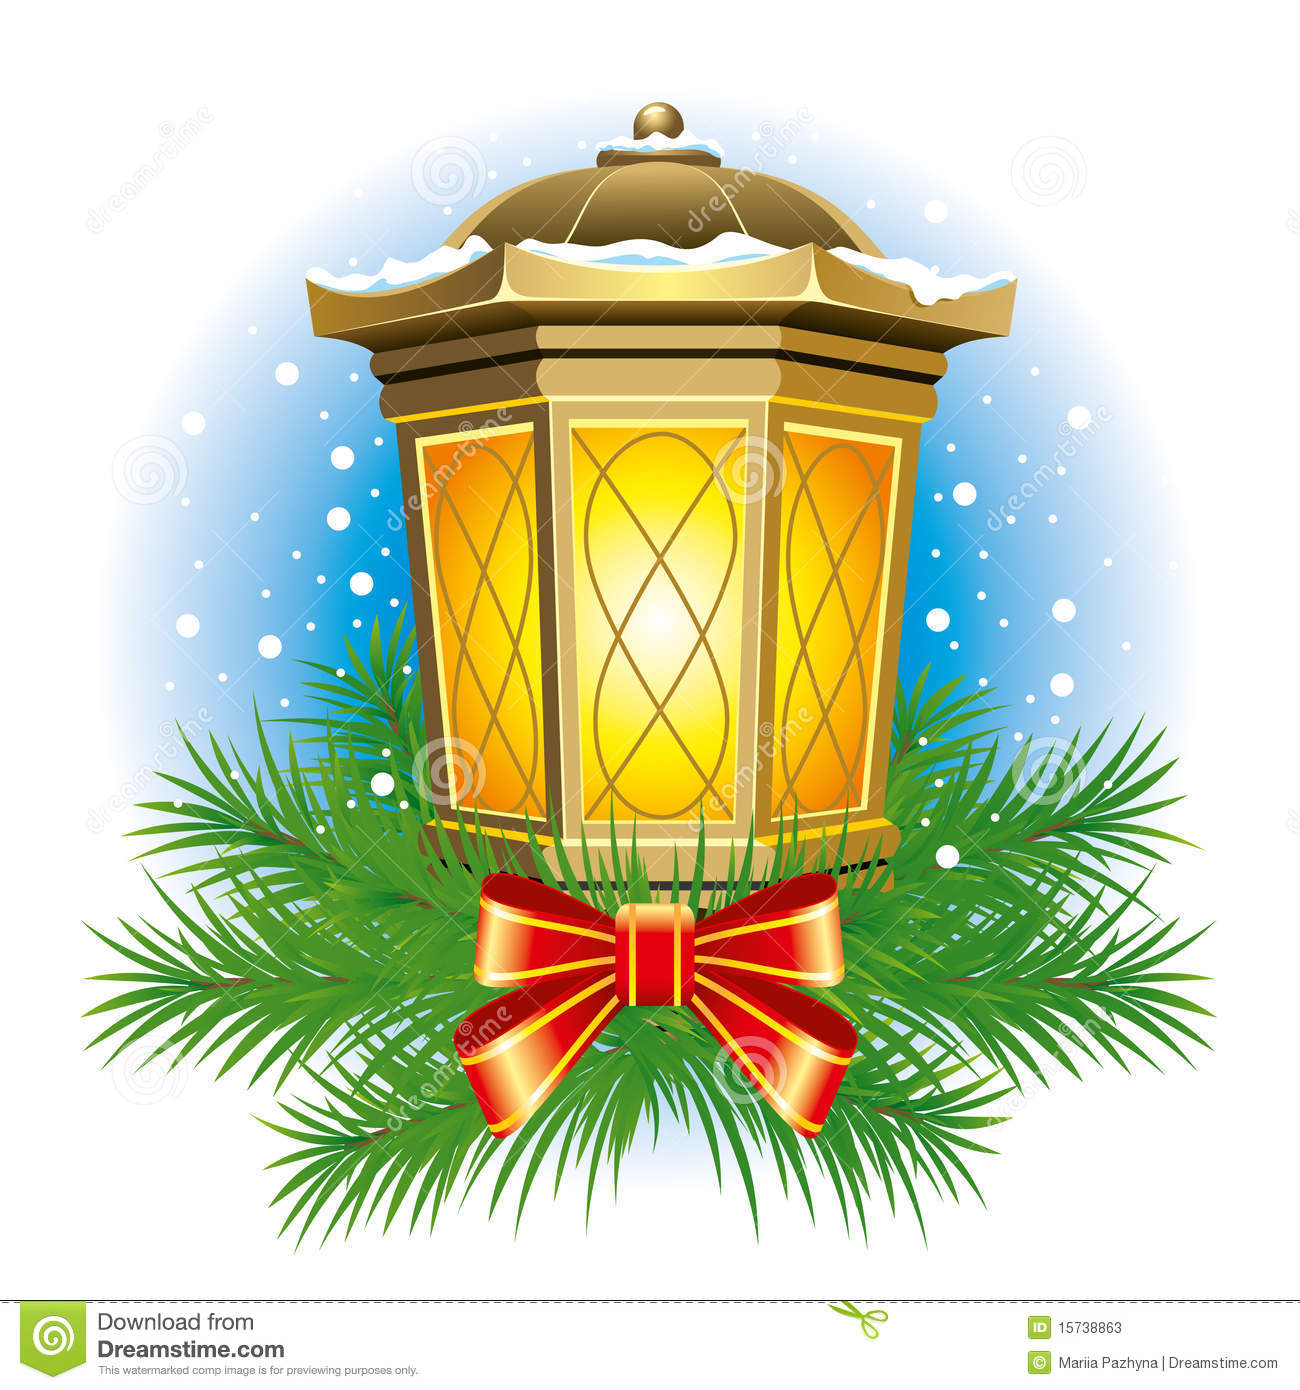 Christmas Lanterns Clipart.